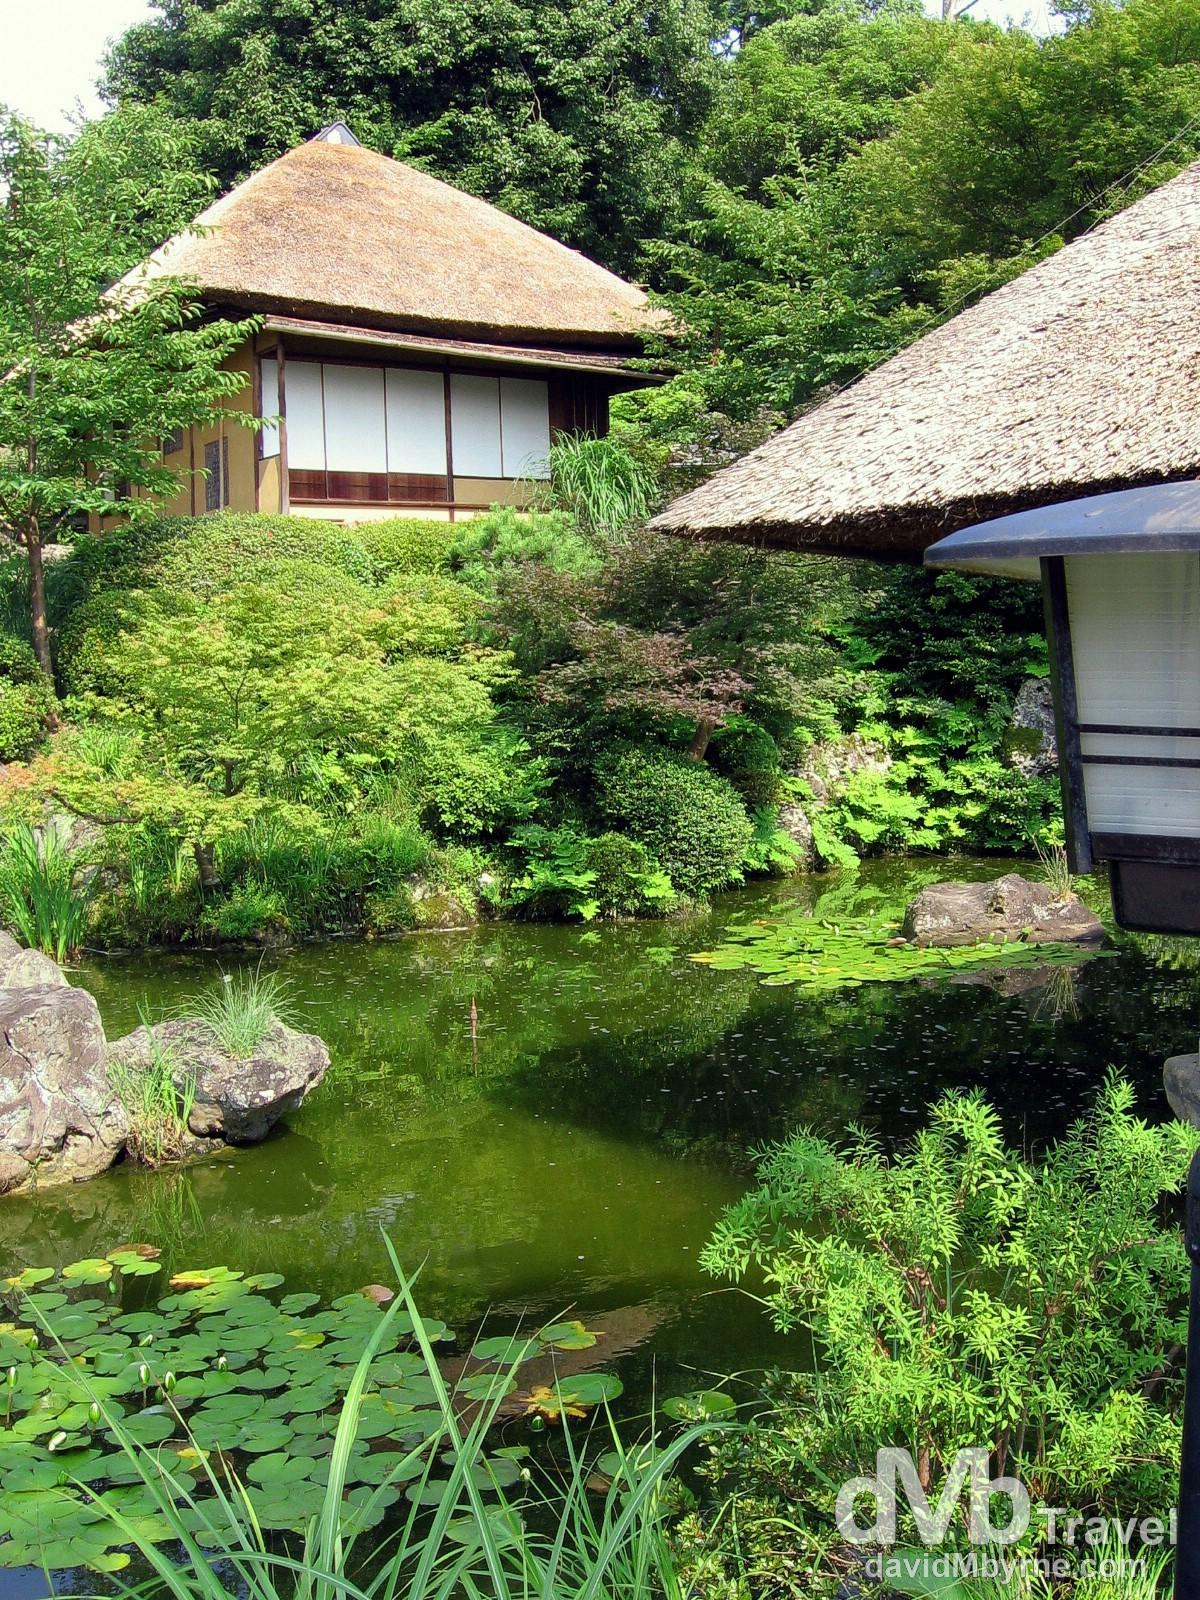 O-chaya (teahouses) in the Higashiyama district of Kyoto, Honshu, Japan. July 18th, 2005.